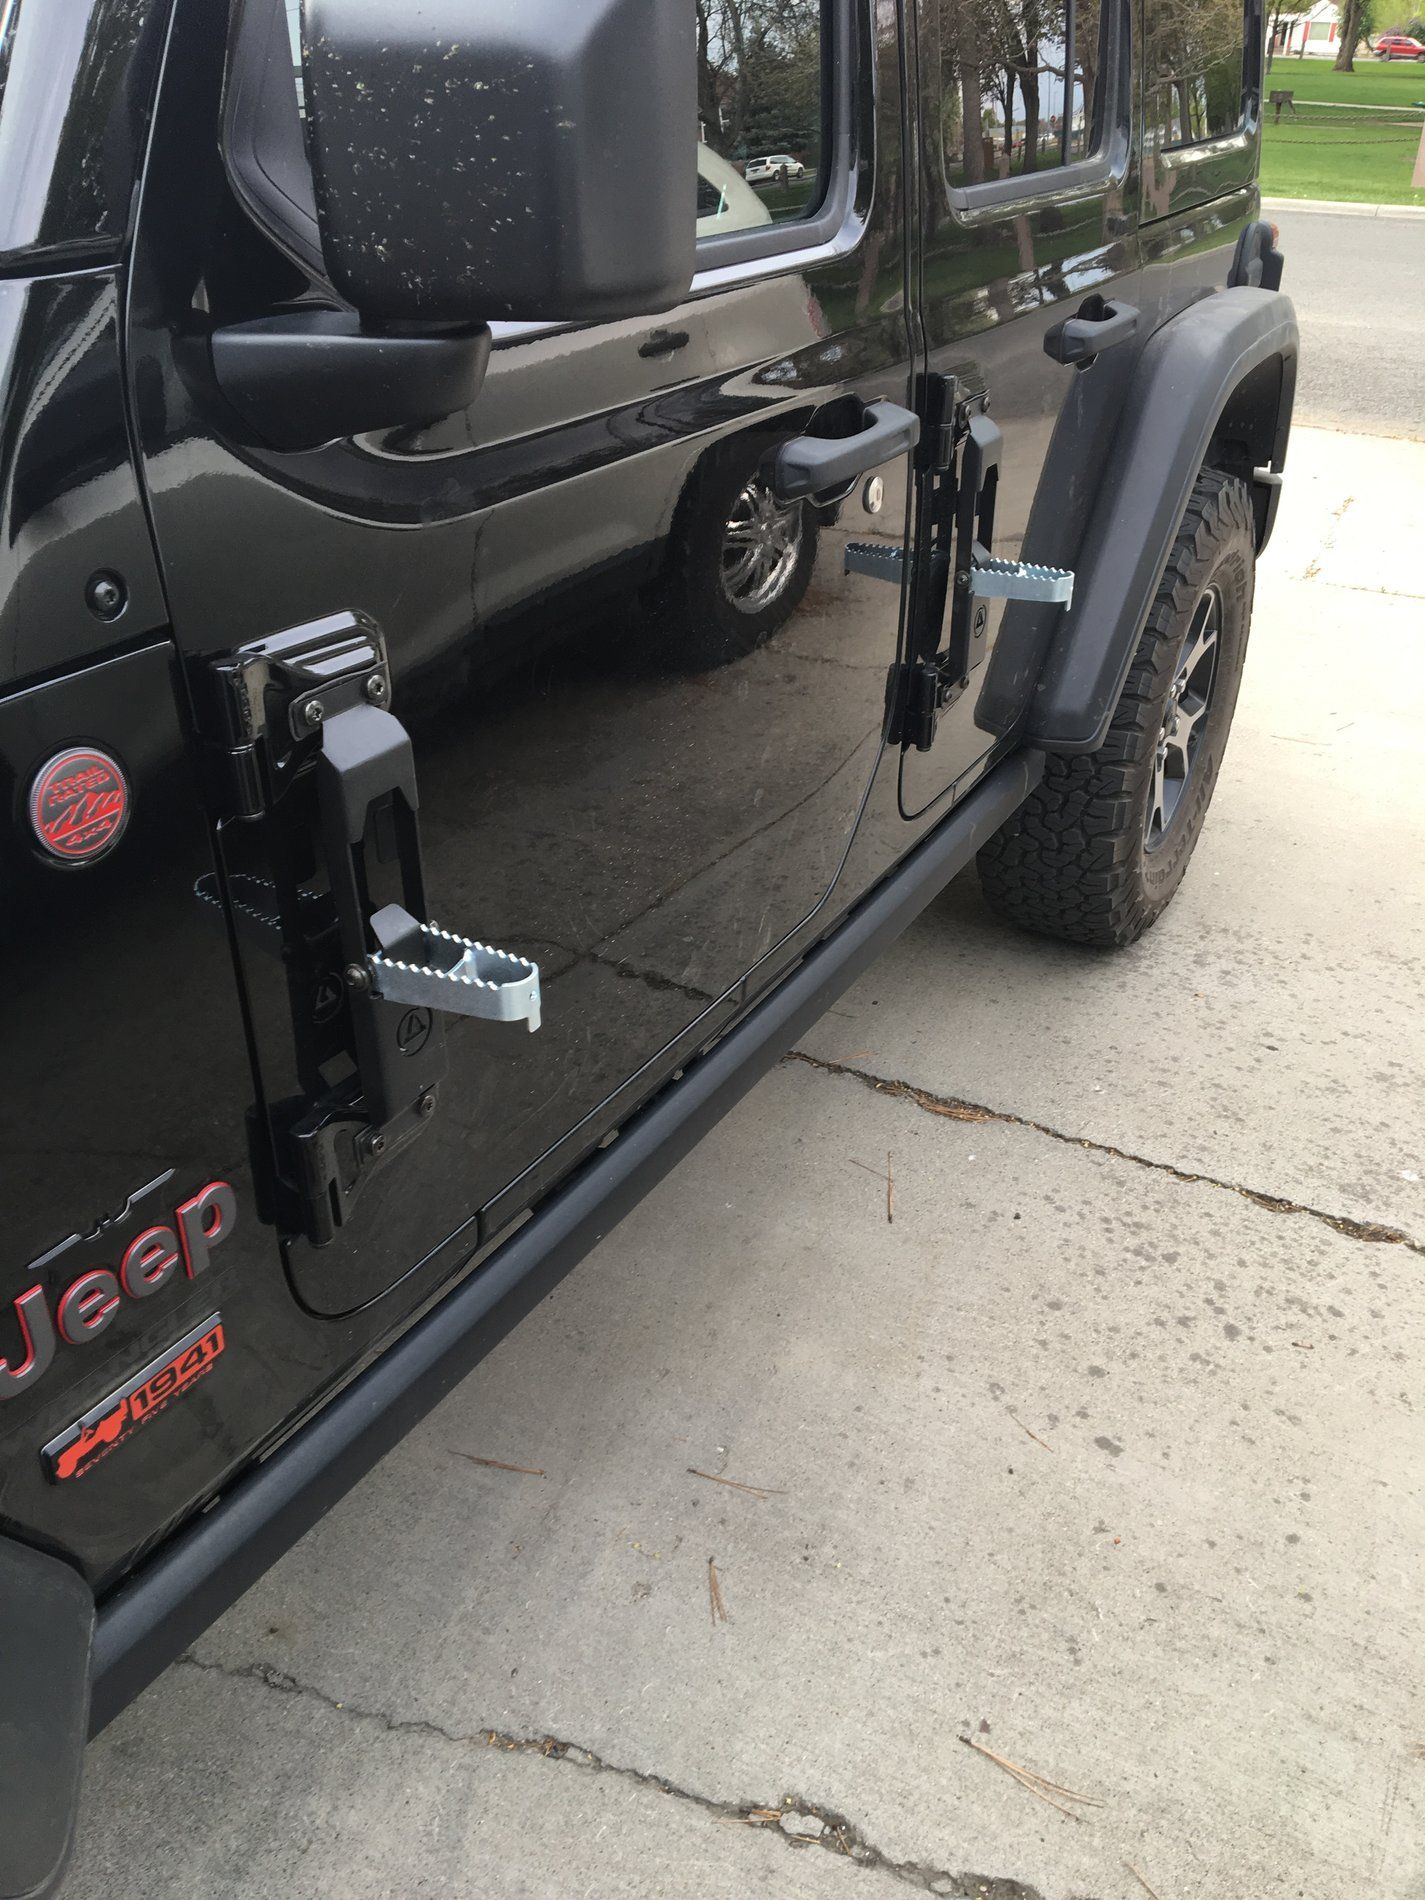 Door Hinge Steps Page 2 2018 Jeep Wrangler Forums Jl Jlu Rubicon Sahara Sport Unlimited Jeep Wrangler Forum Jeep Accessories Jeep Wrangler Sport